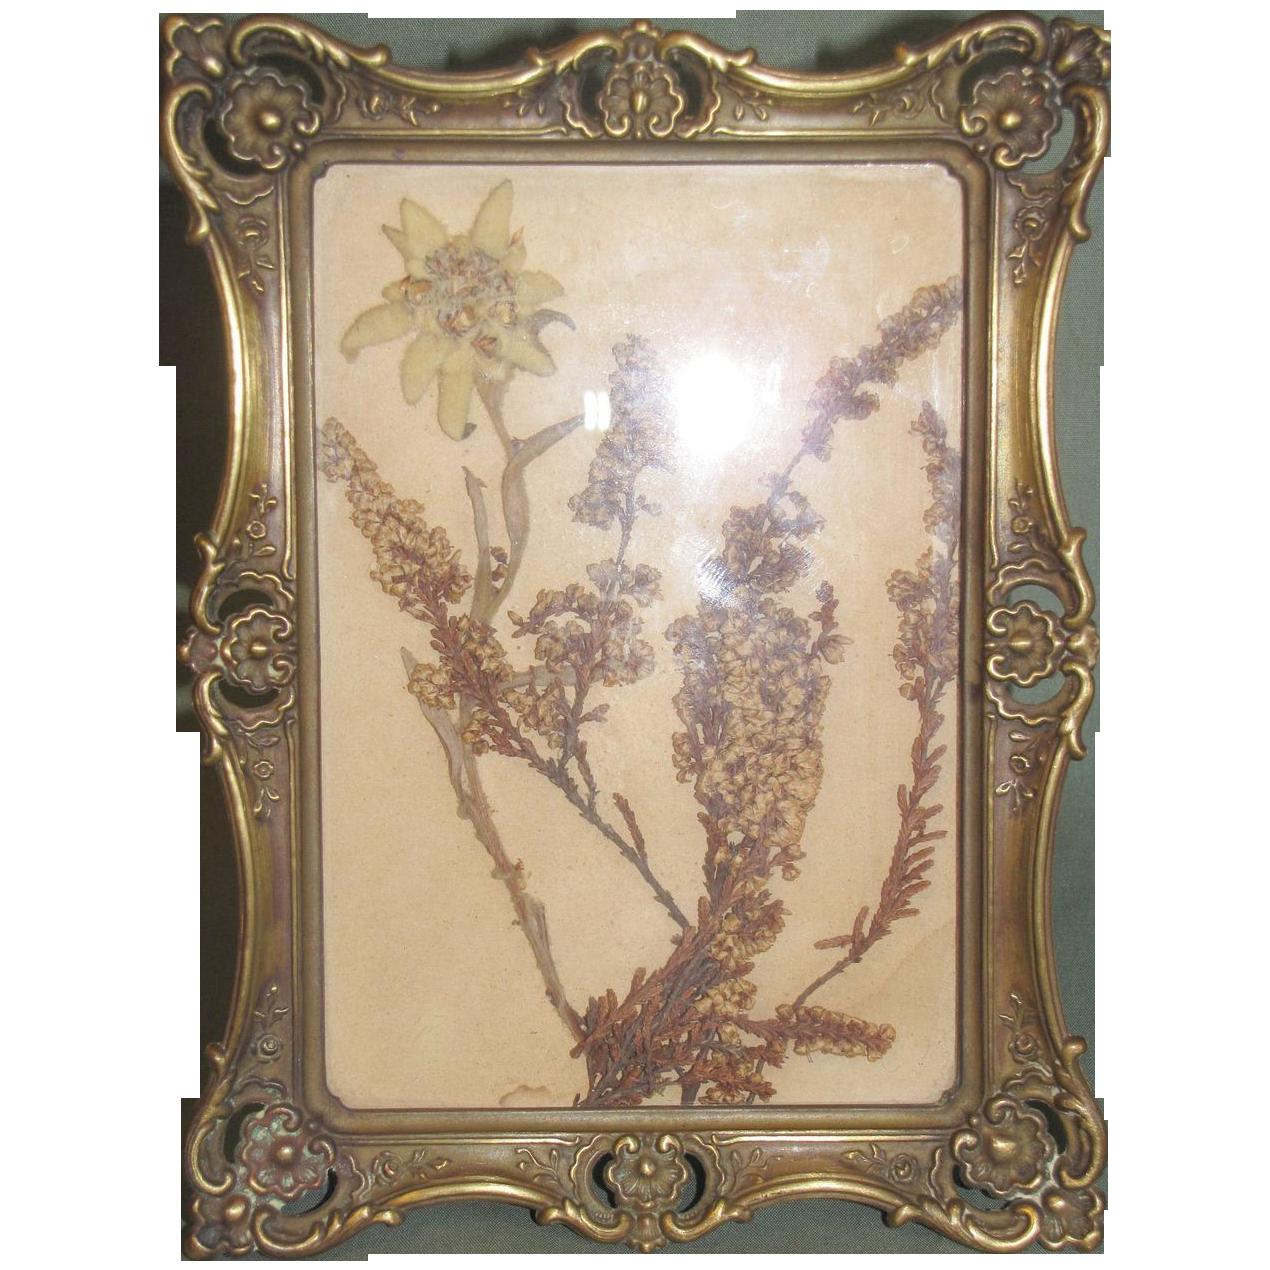 Lovely Brass Table-Top Photograph Frame Circa 1897